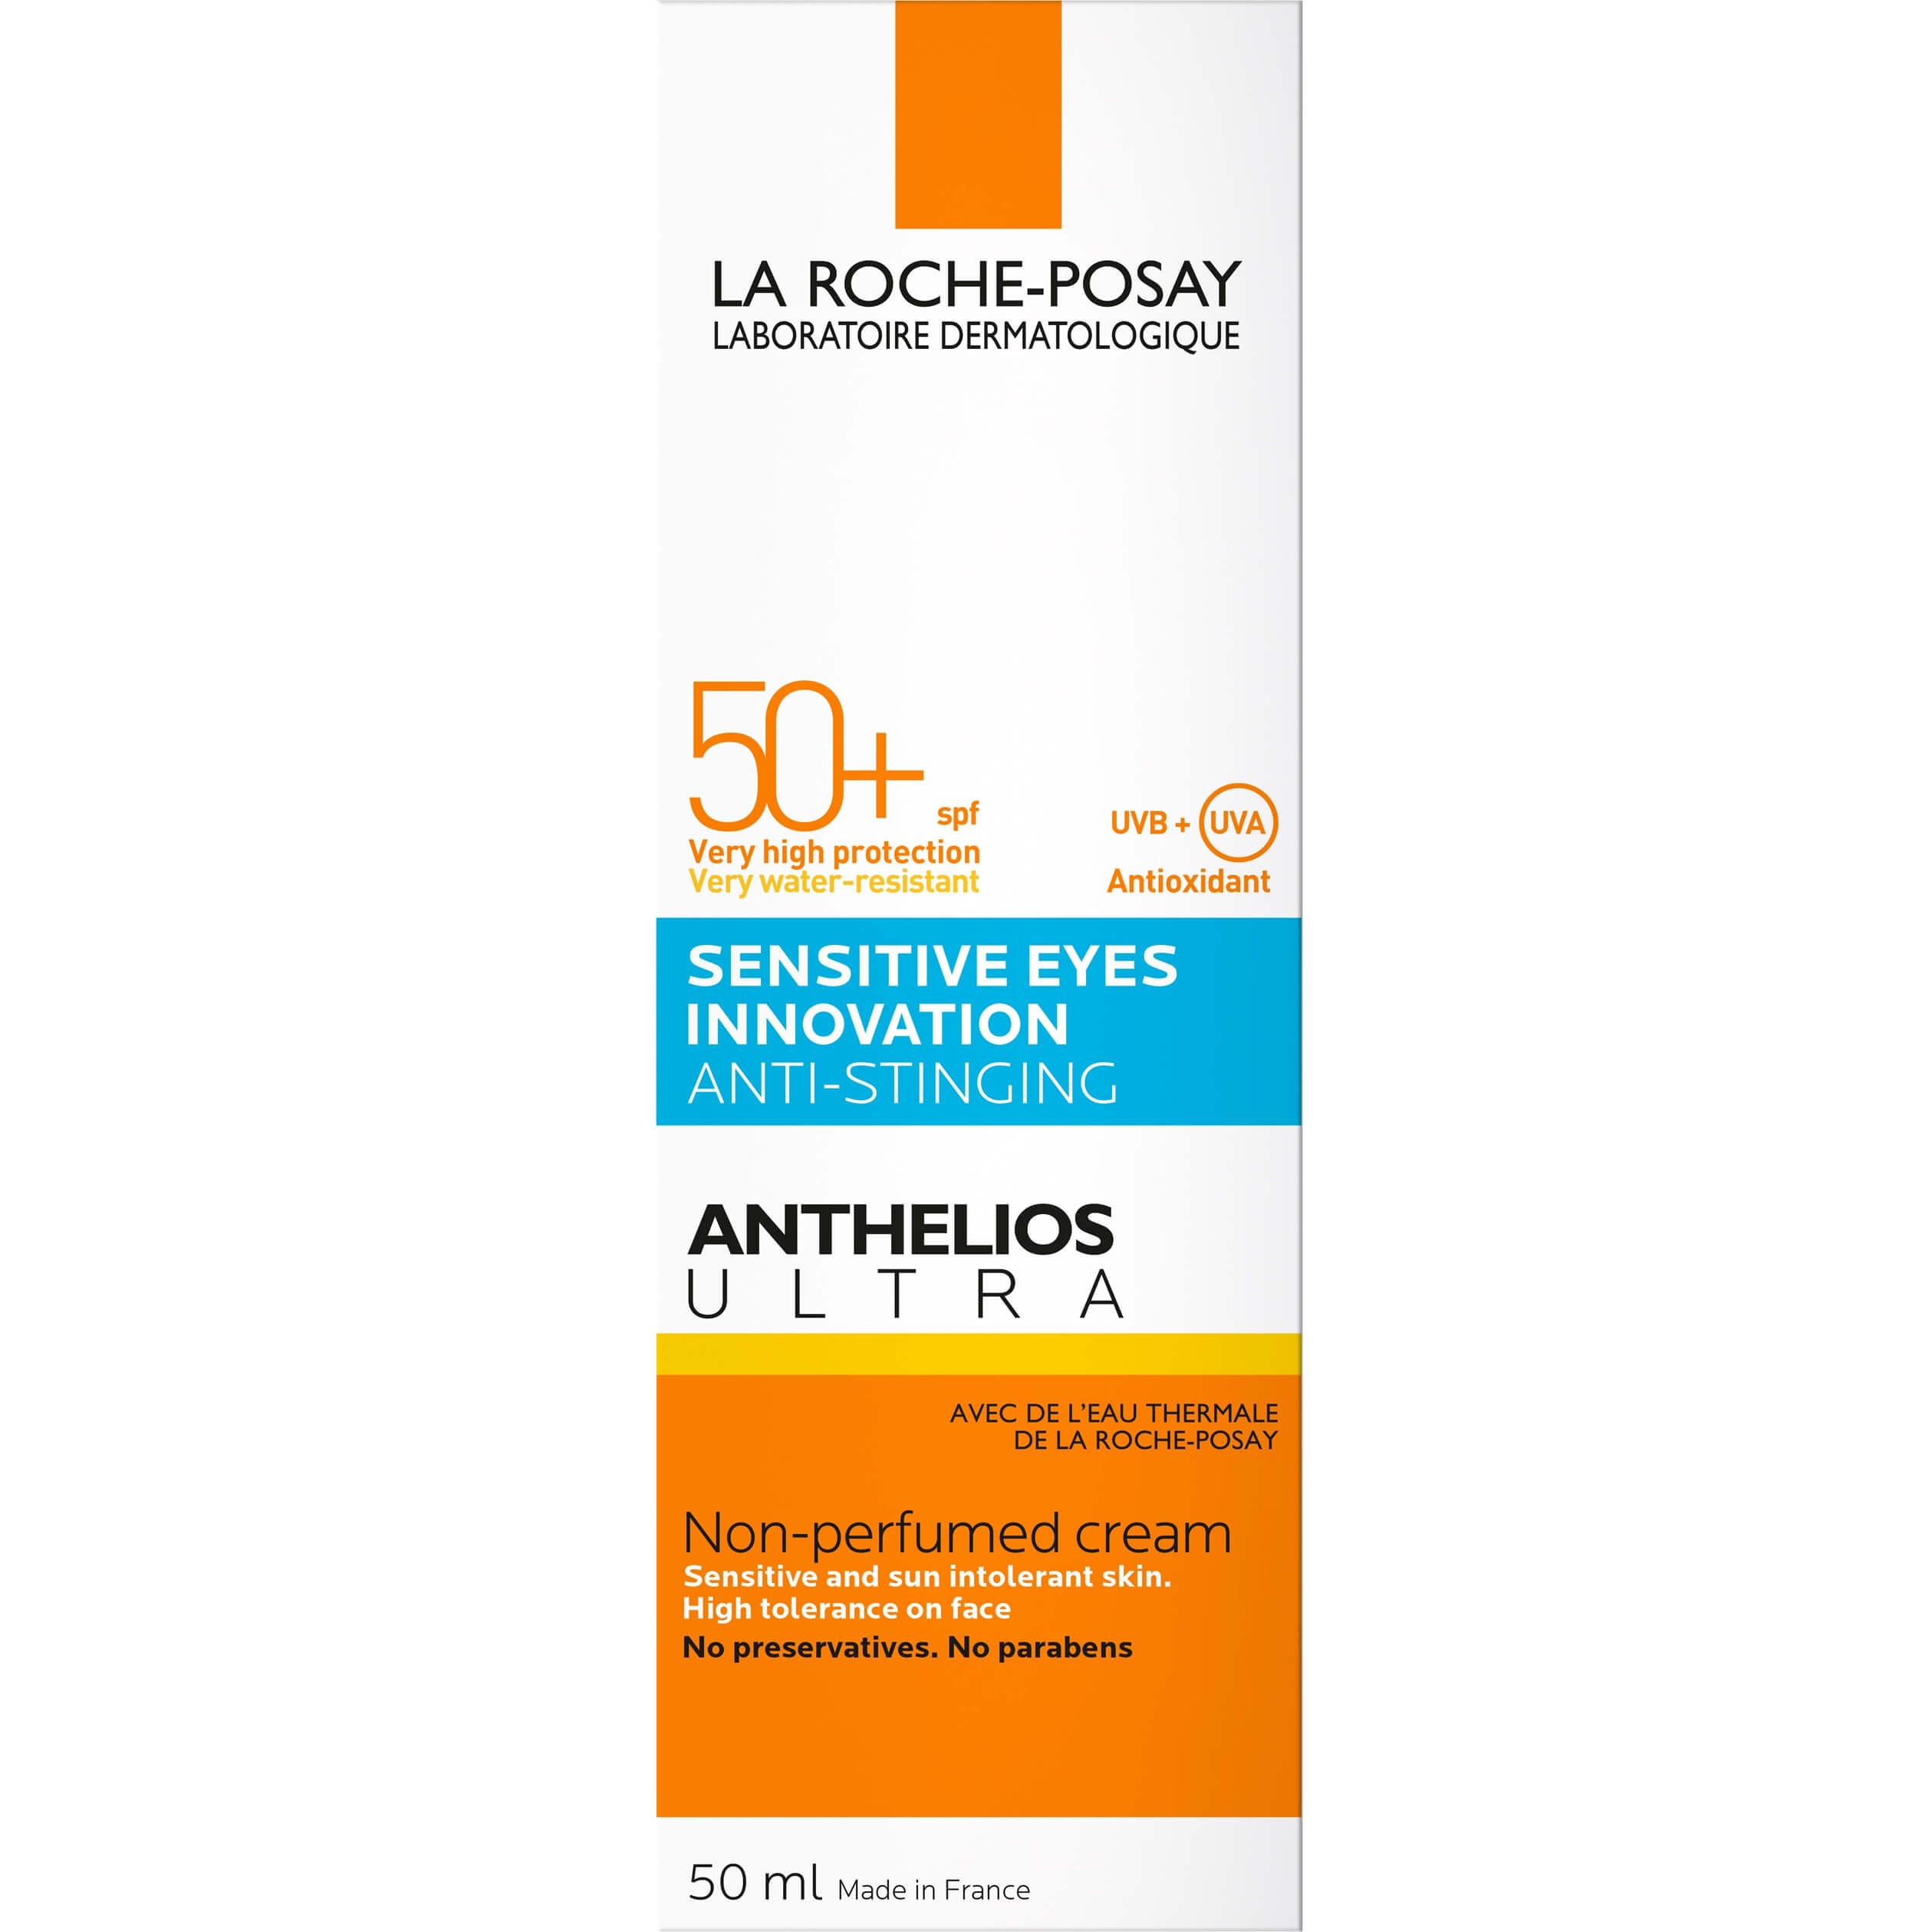 La Roche-Posay Anthelios Ultra Sensitive Eyes InnovationCream Spf50+ Αντηλιακό Προσώπου Χωρίς Άρωμα50ml